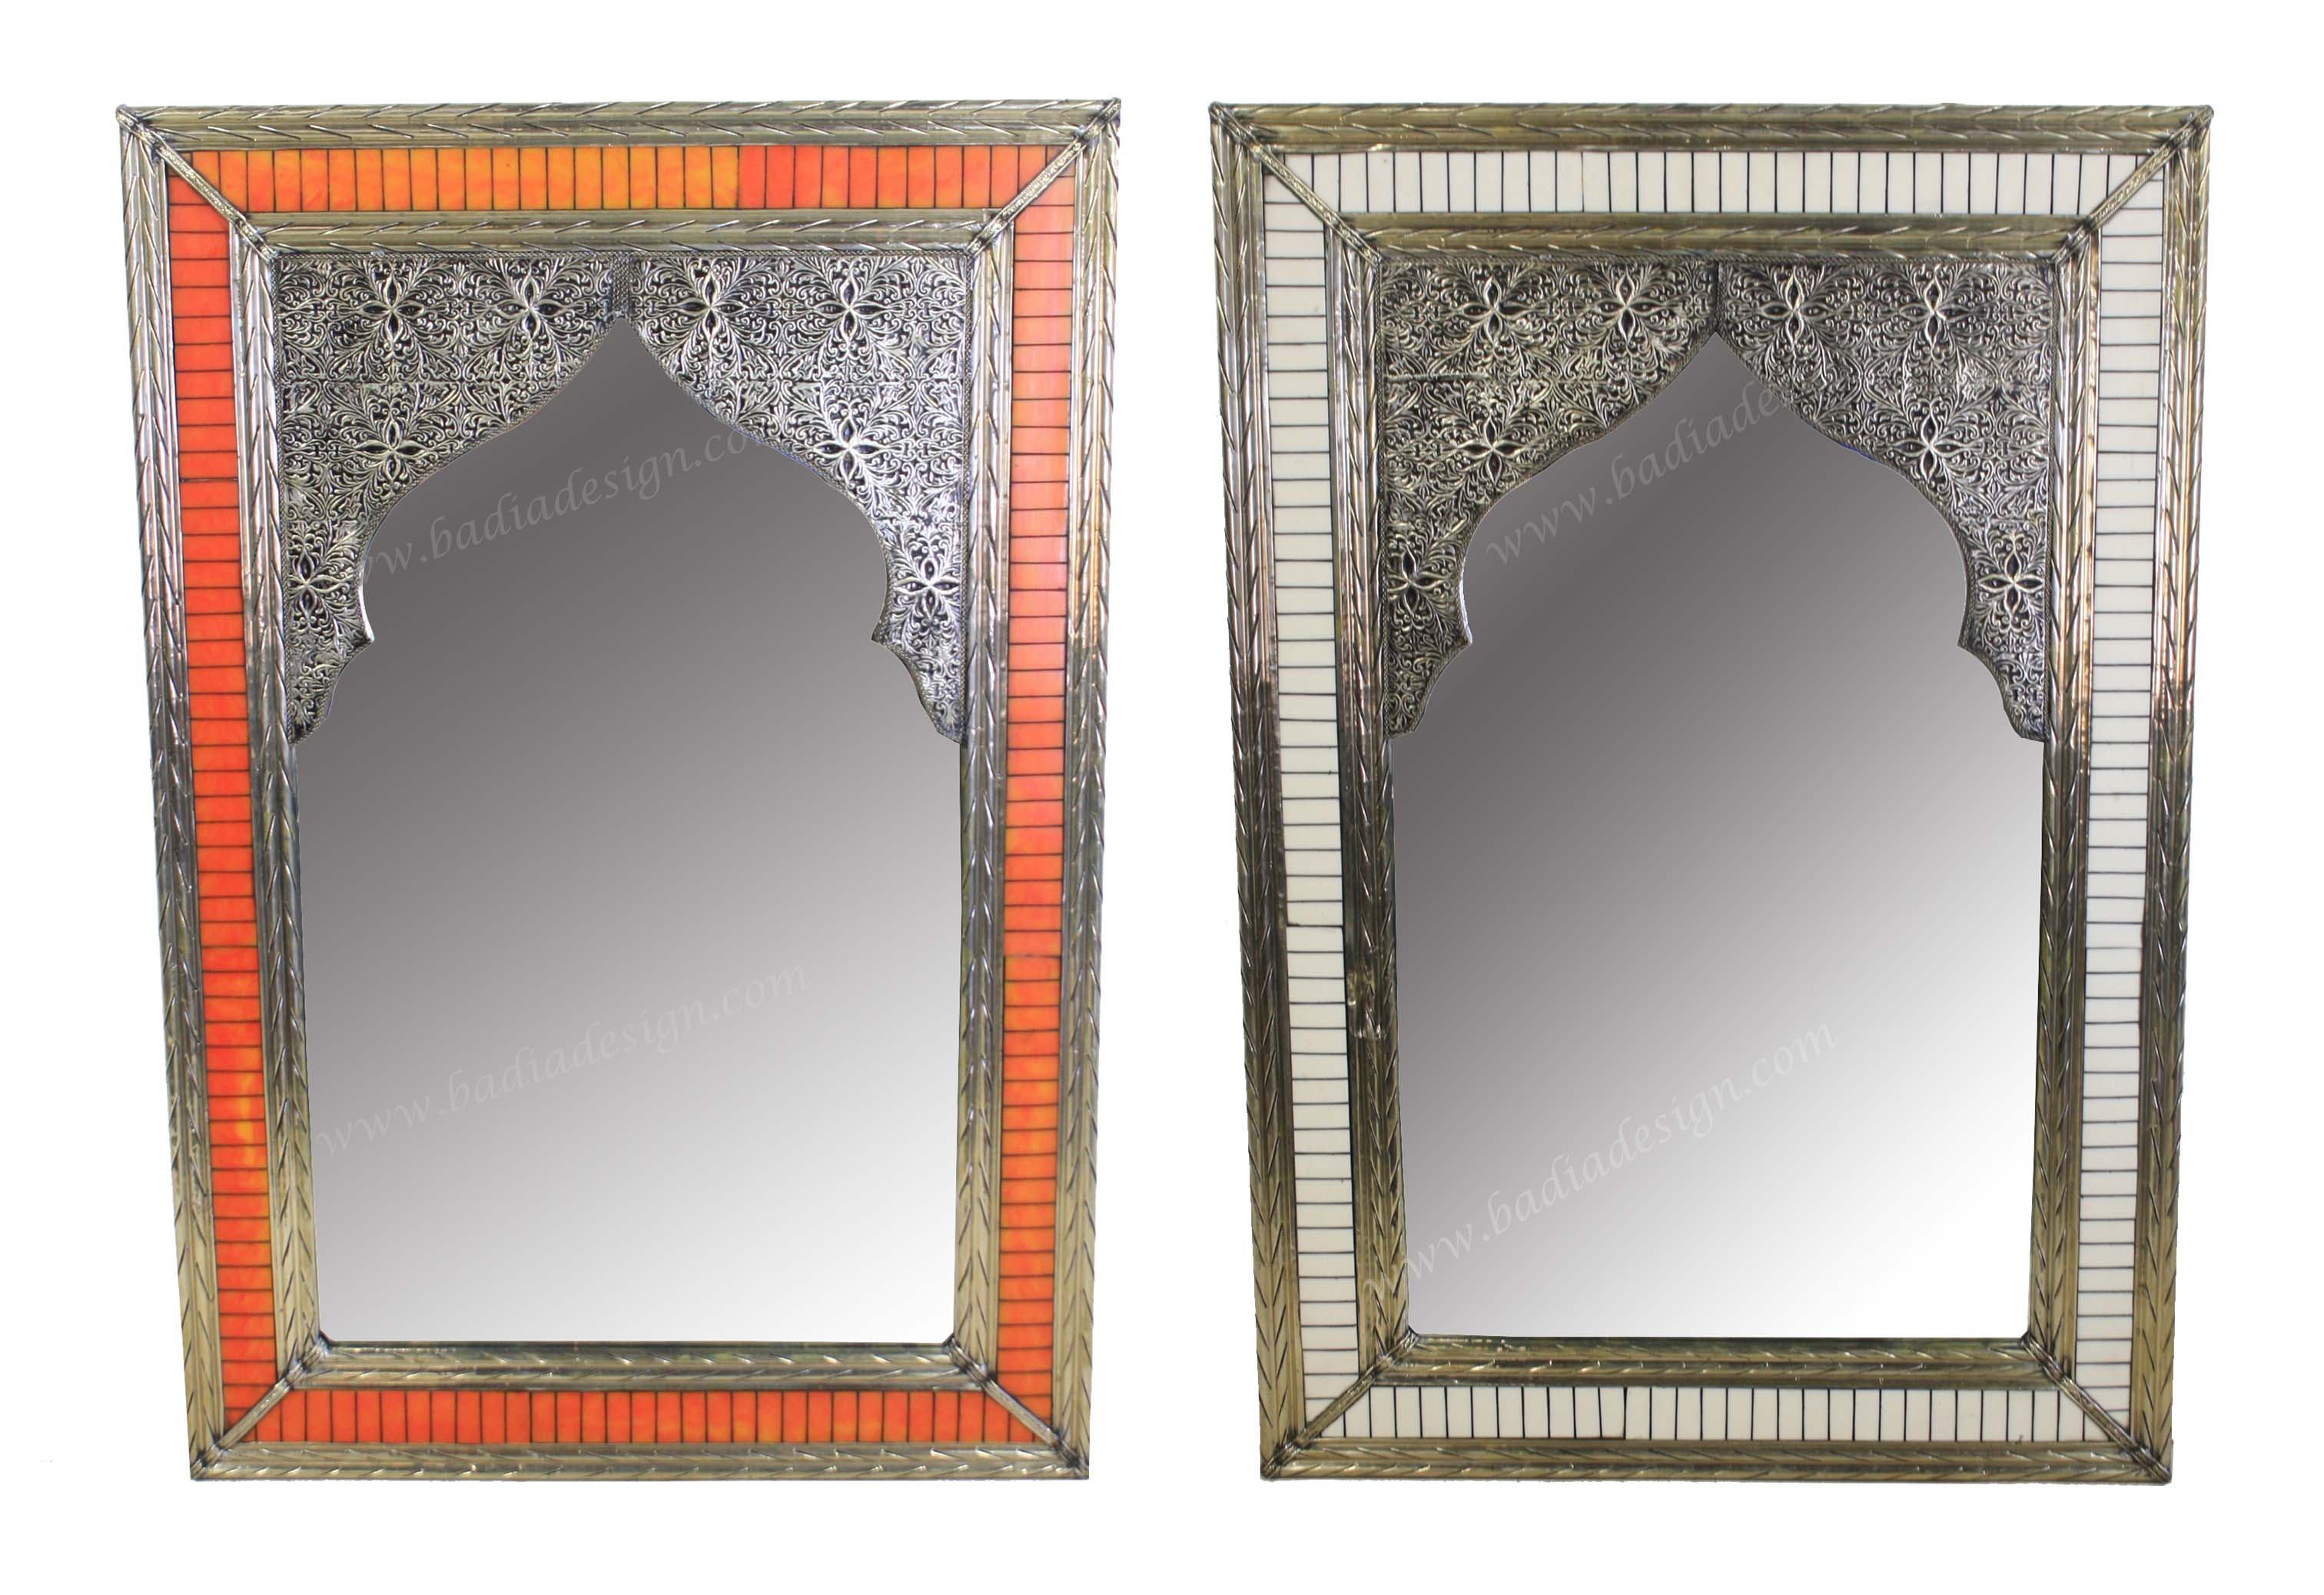 moroccan-camel-bone-mirror-m-mb069.jpg